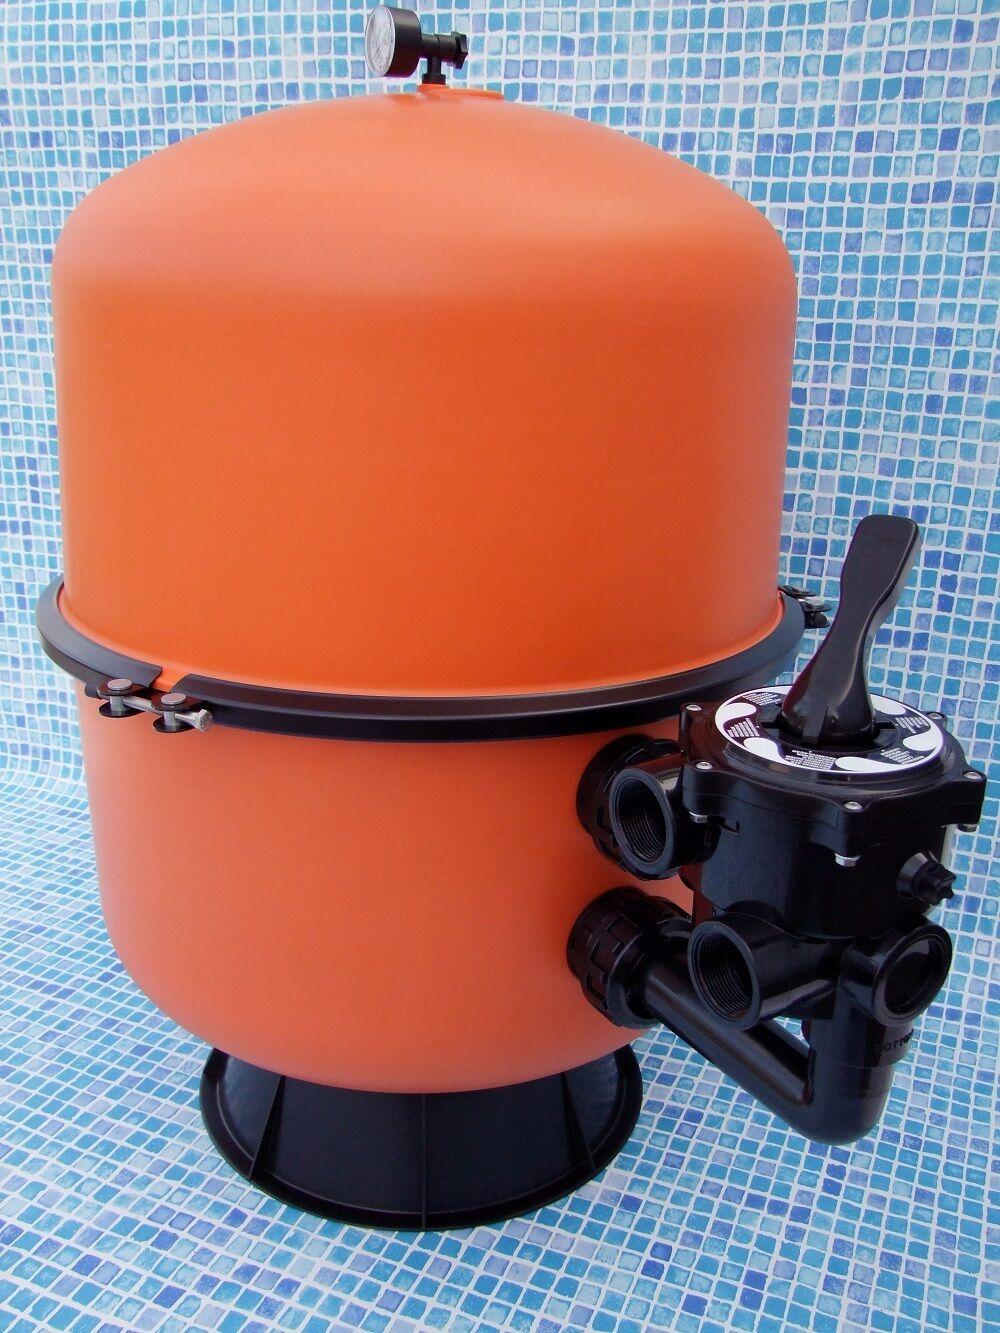 Filterkessel Bilbao 600 mm Durchmesser geteilt Kessel Sandfilter teilbar